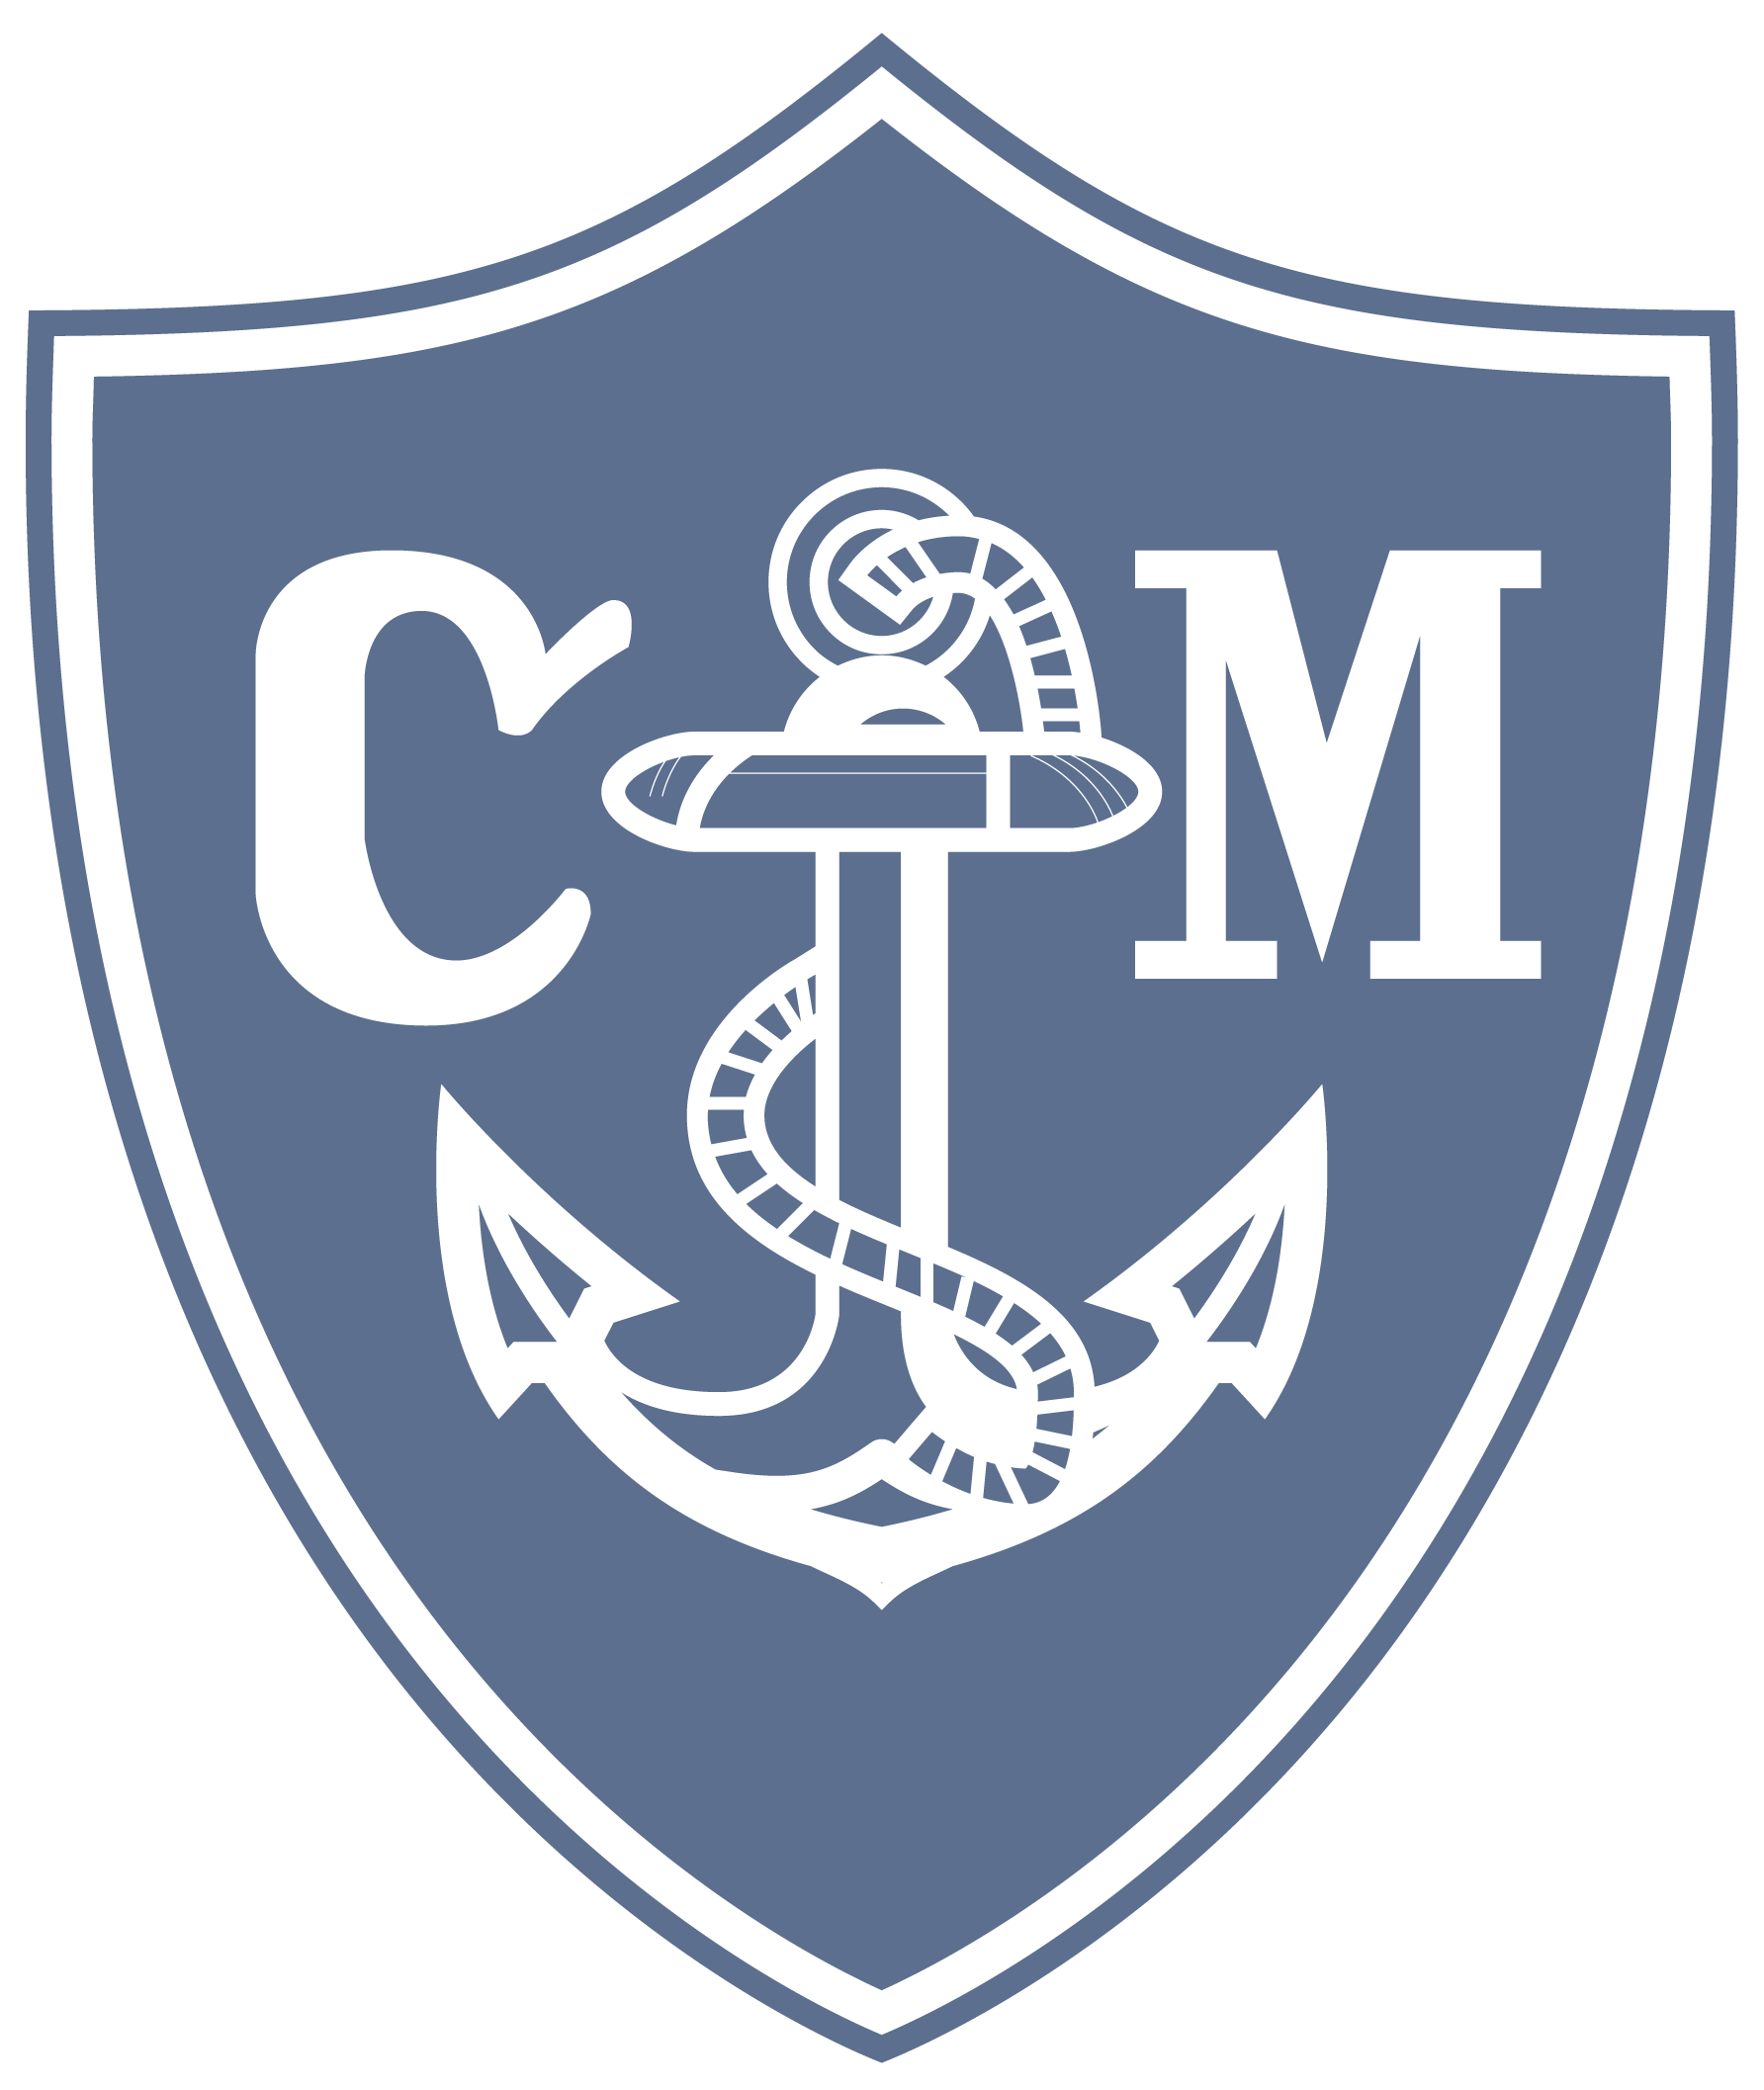 Único Casco De Fútbol Universitario Para Colorear Molde - Enmarcado ...